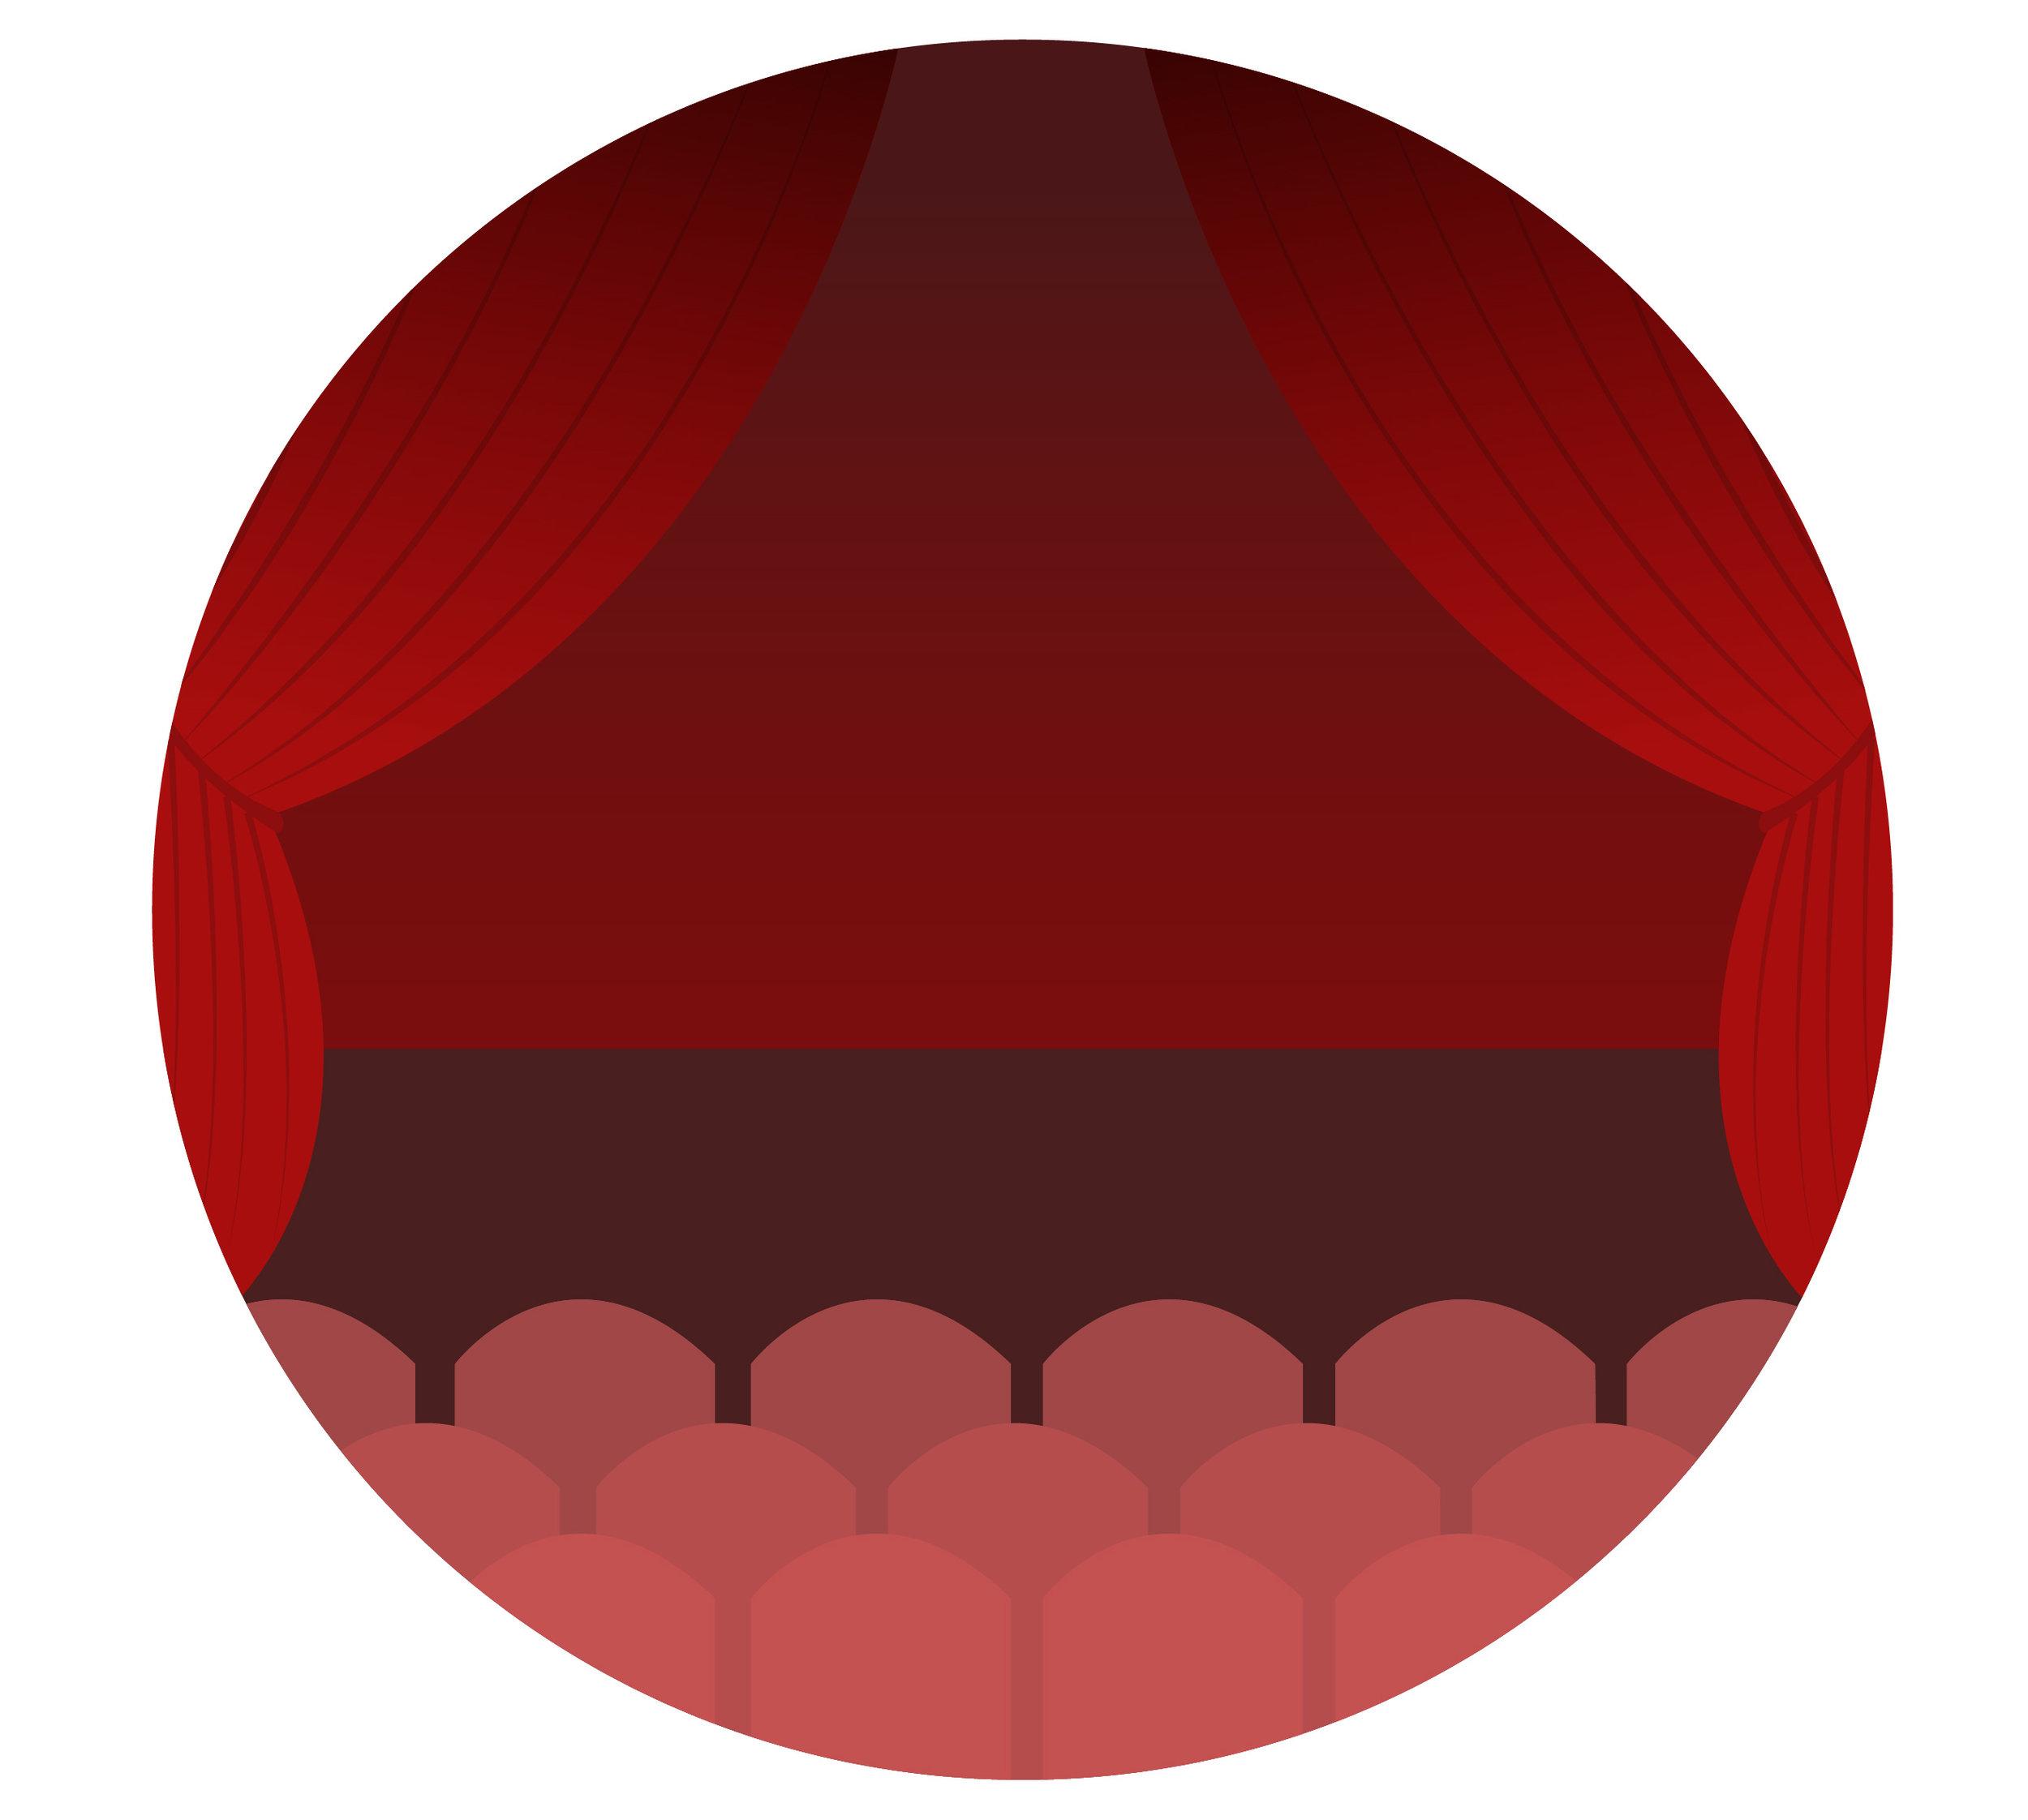 theater stage illustration.jpg